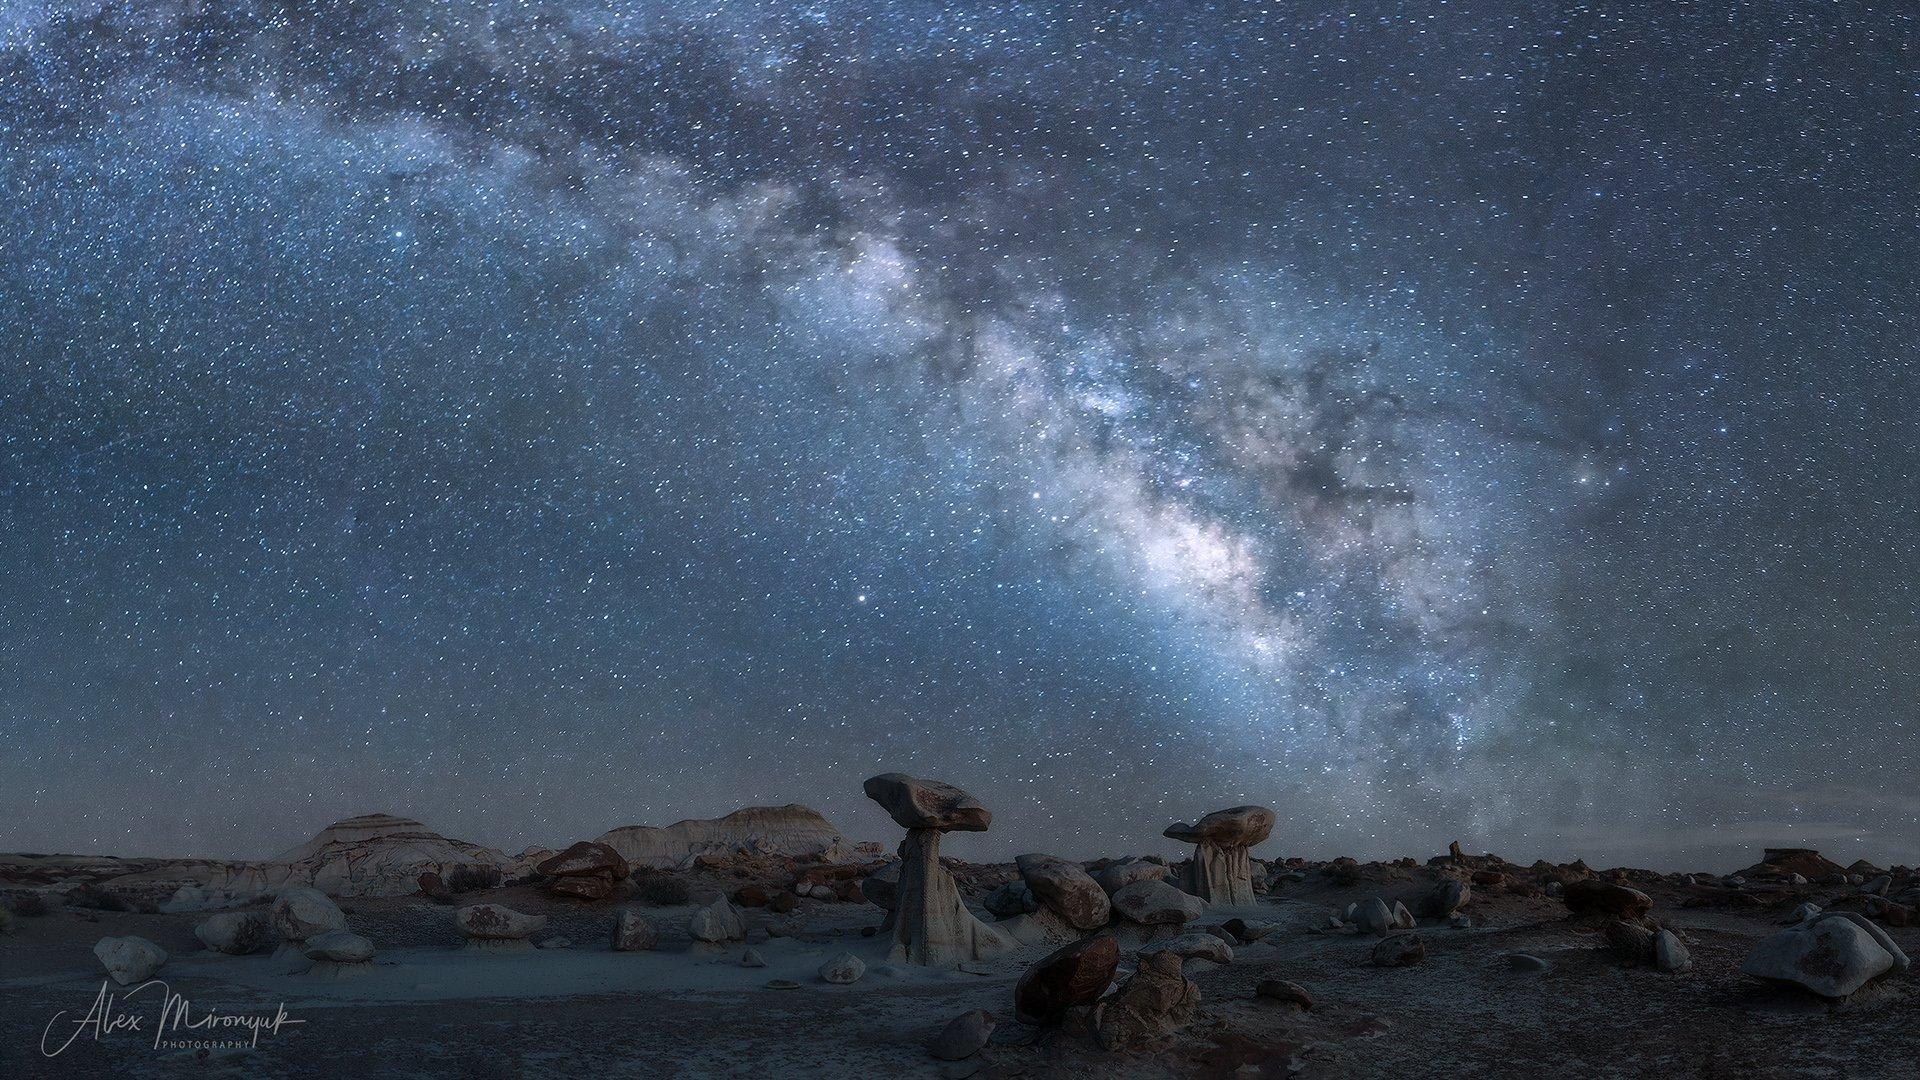 сша, пустыня, бэдлендс, глиняная, панорама, млечный, путь, звезды, ночь, скалы, грибы, каменные, Alex Mironyuk